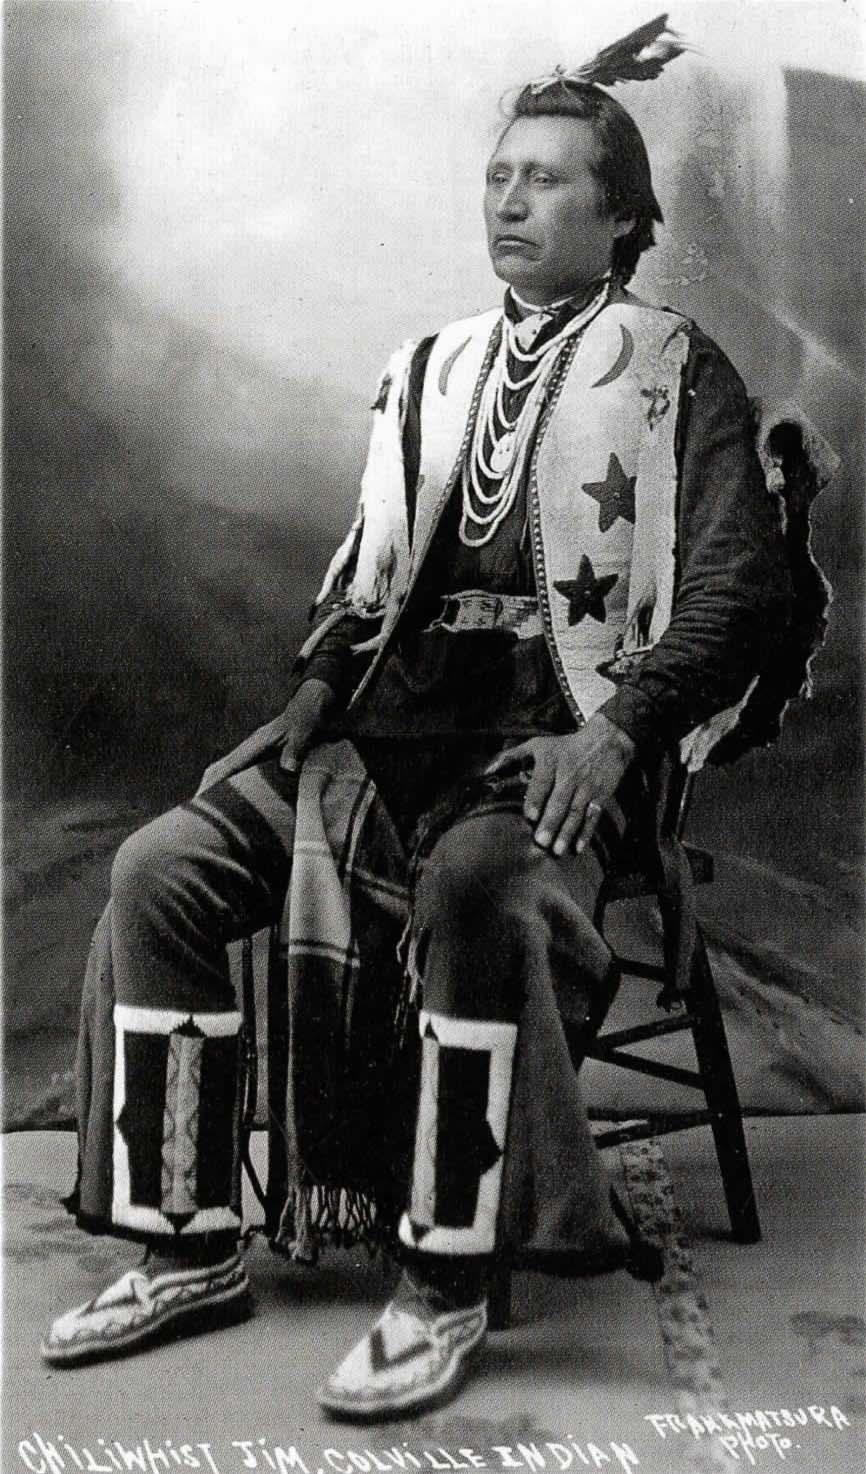 Chili-whist Jim,  1910